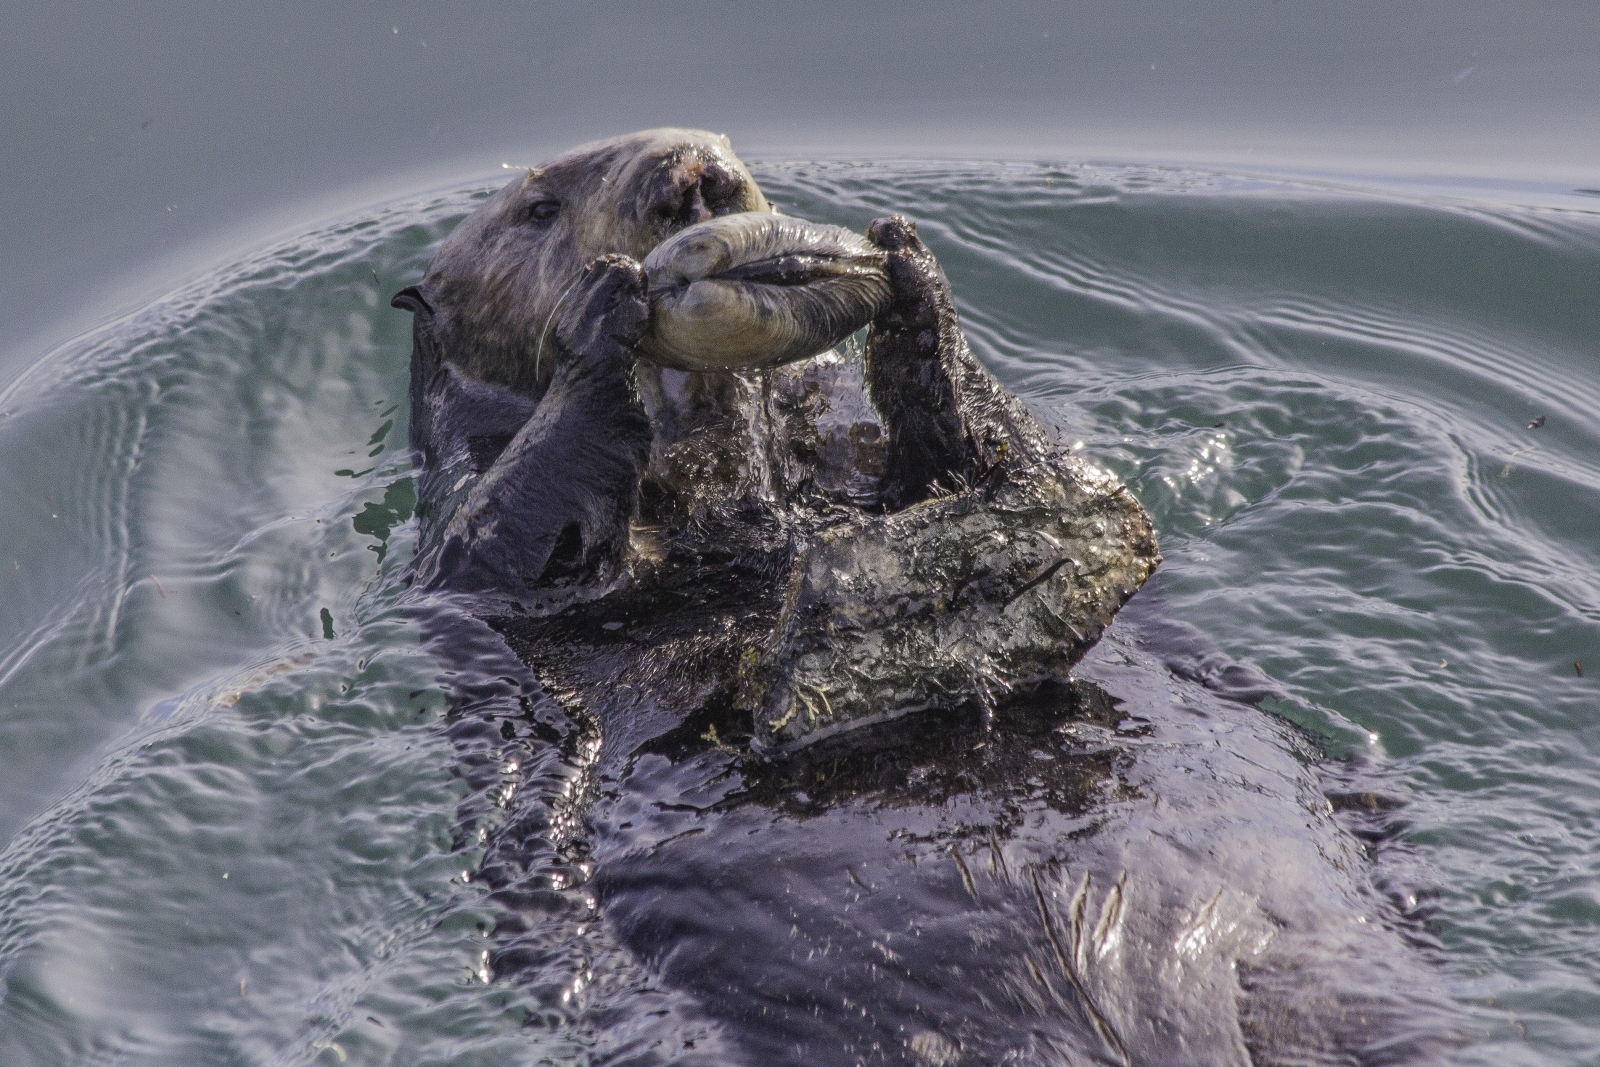 sea otter tool use